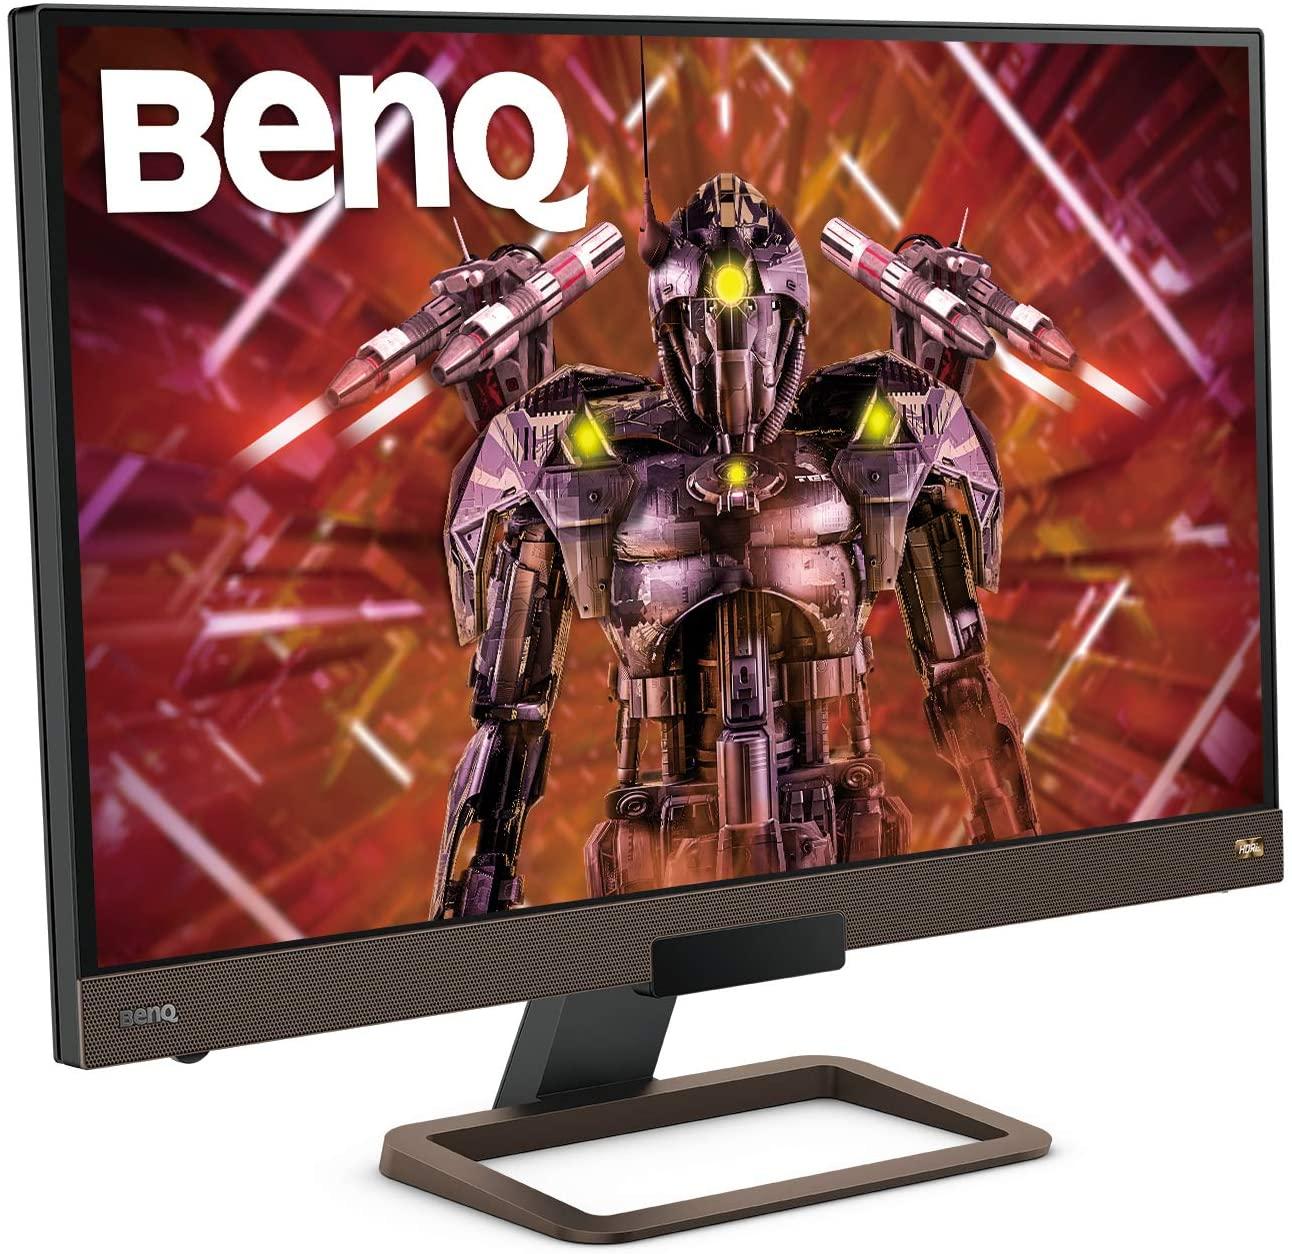 "BenQ EX2780Q - Monitor Gaming de 27"" 2K QHD (2560x1440, 5ms, 144Hz, 2x HDMI, IPS, HDRi, DCI-P3, DP, USB-C, FreeSync, altavoces, mando a distancia, antireflejos, sin parpadeo) - Gris metalizado"